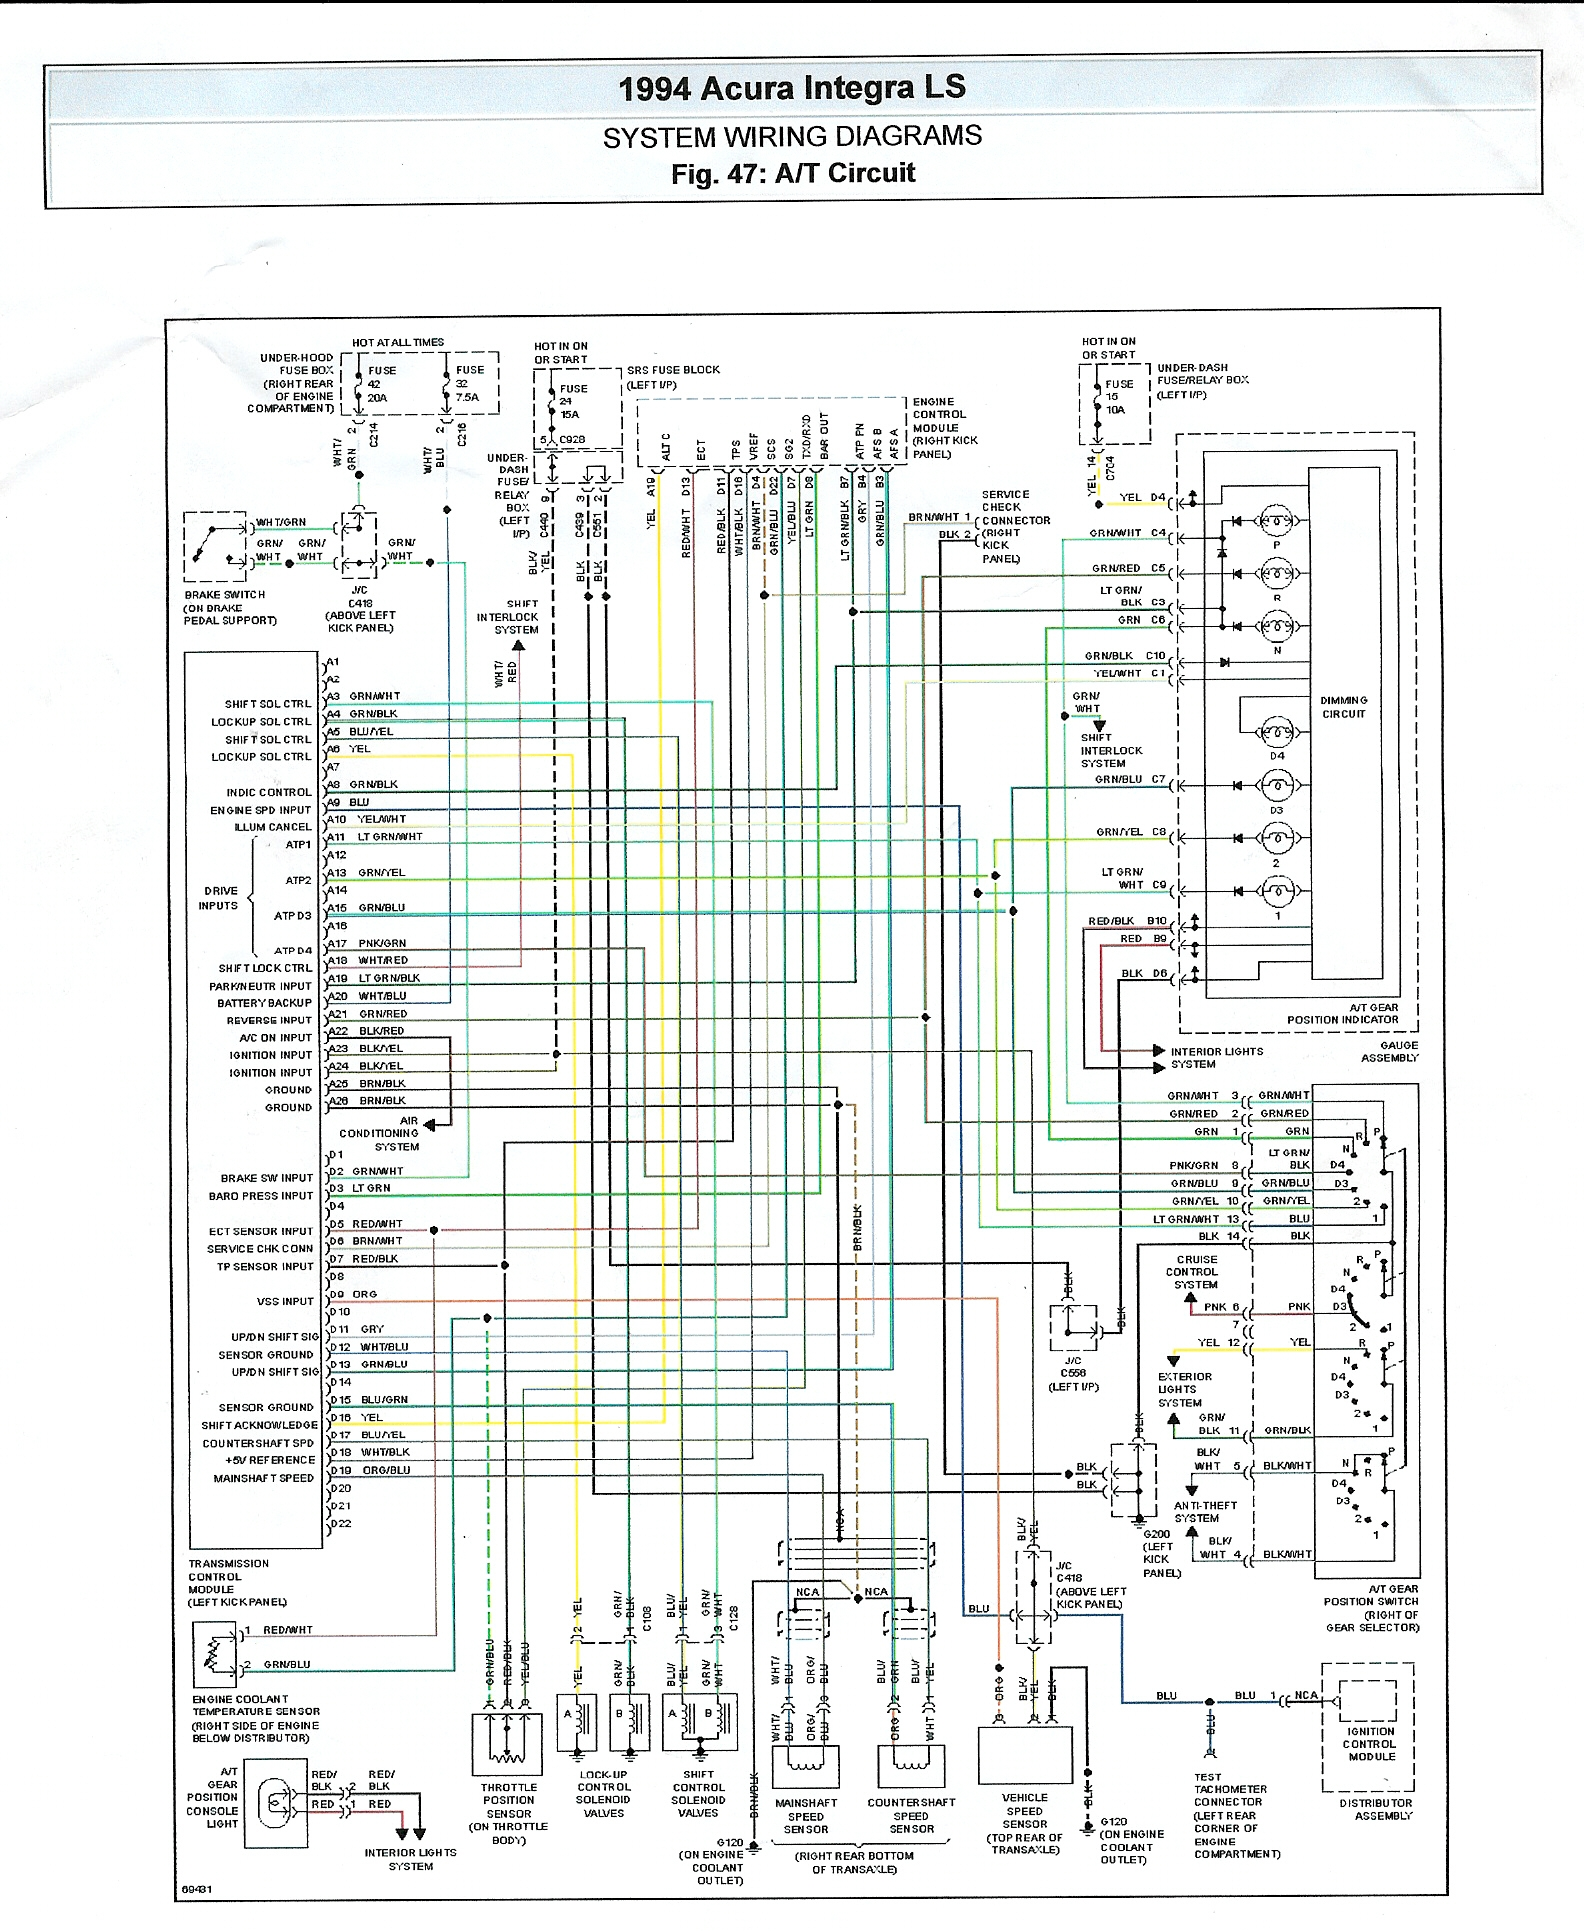 Wiring Diagram 1992 Acura Integra Books Of Wiring Diagram \u2022 1990 Acura  Vigor 1992 Acura Vigor Fuse Diagram